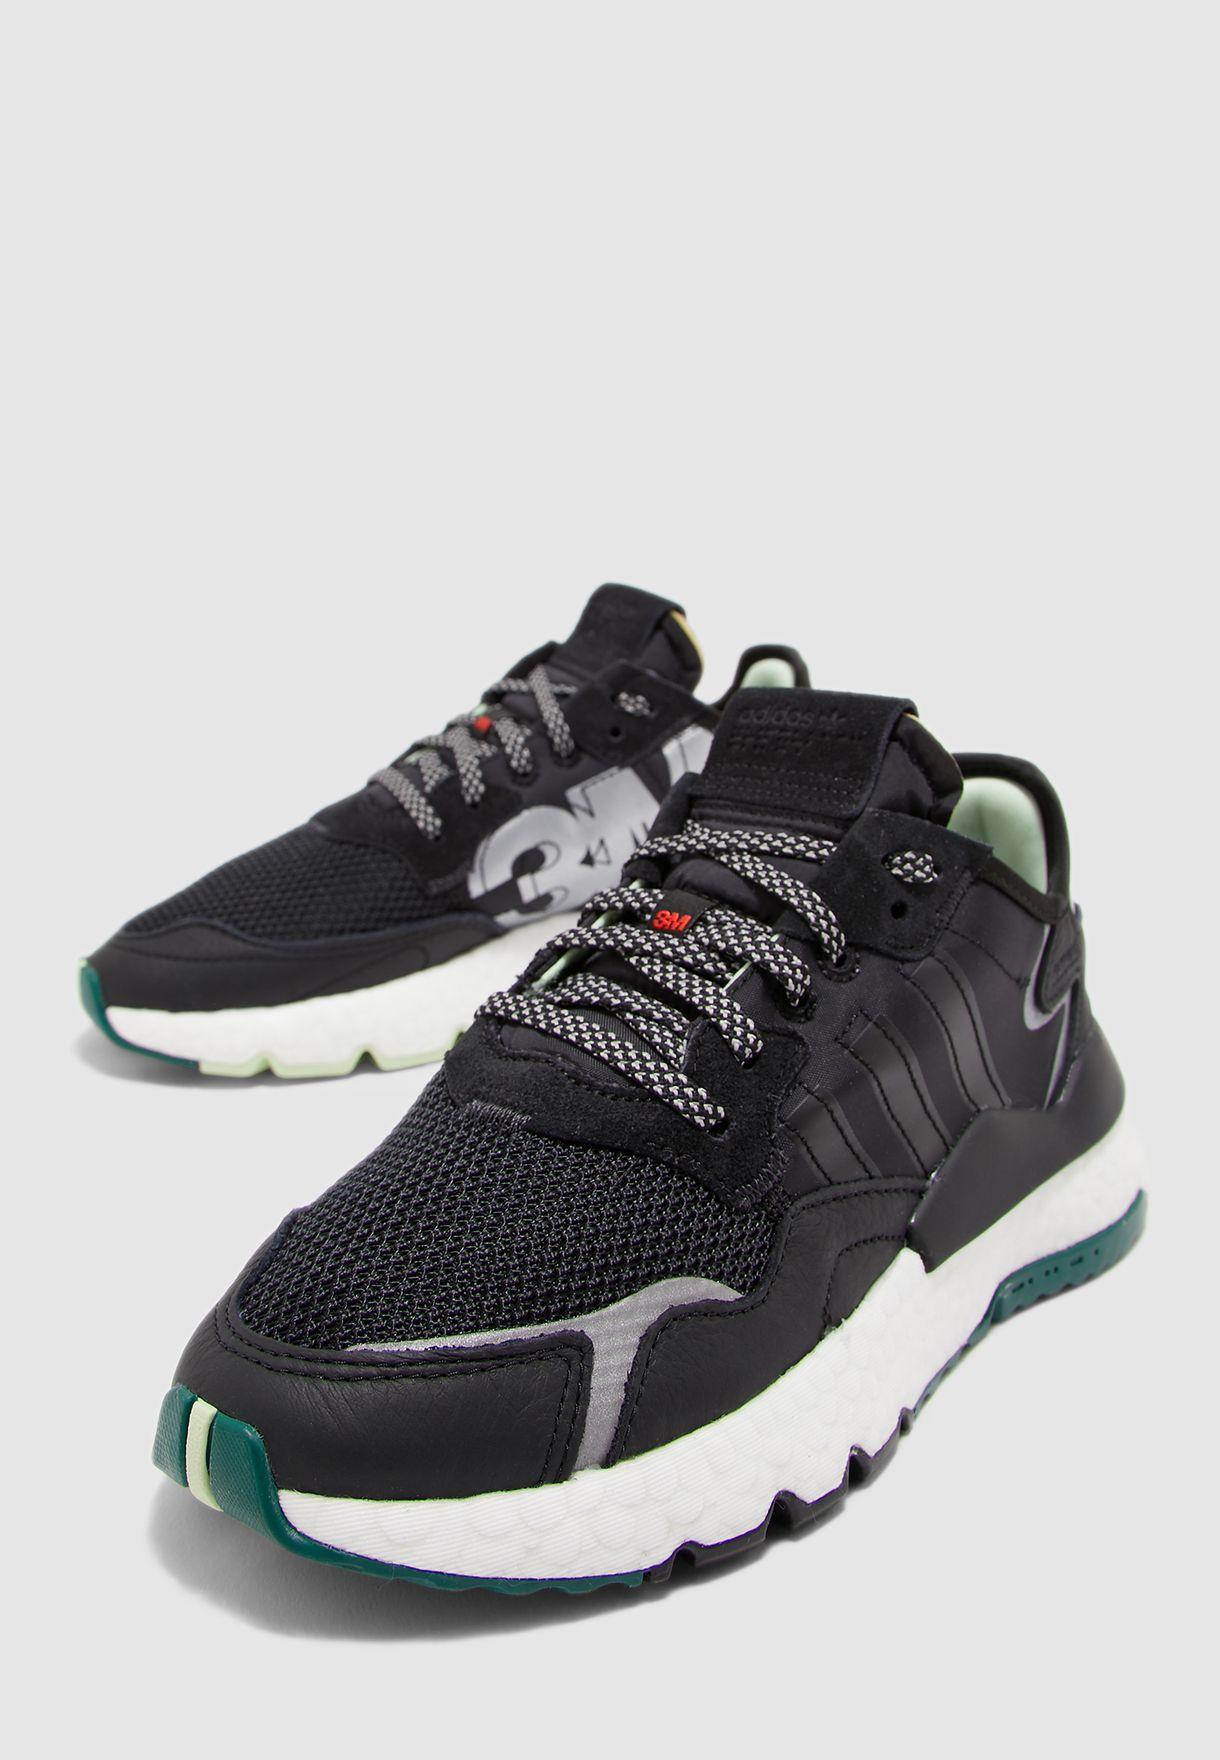 adidas originals nite jogger women's